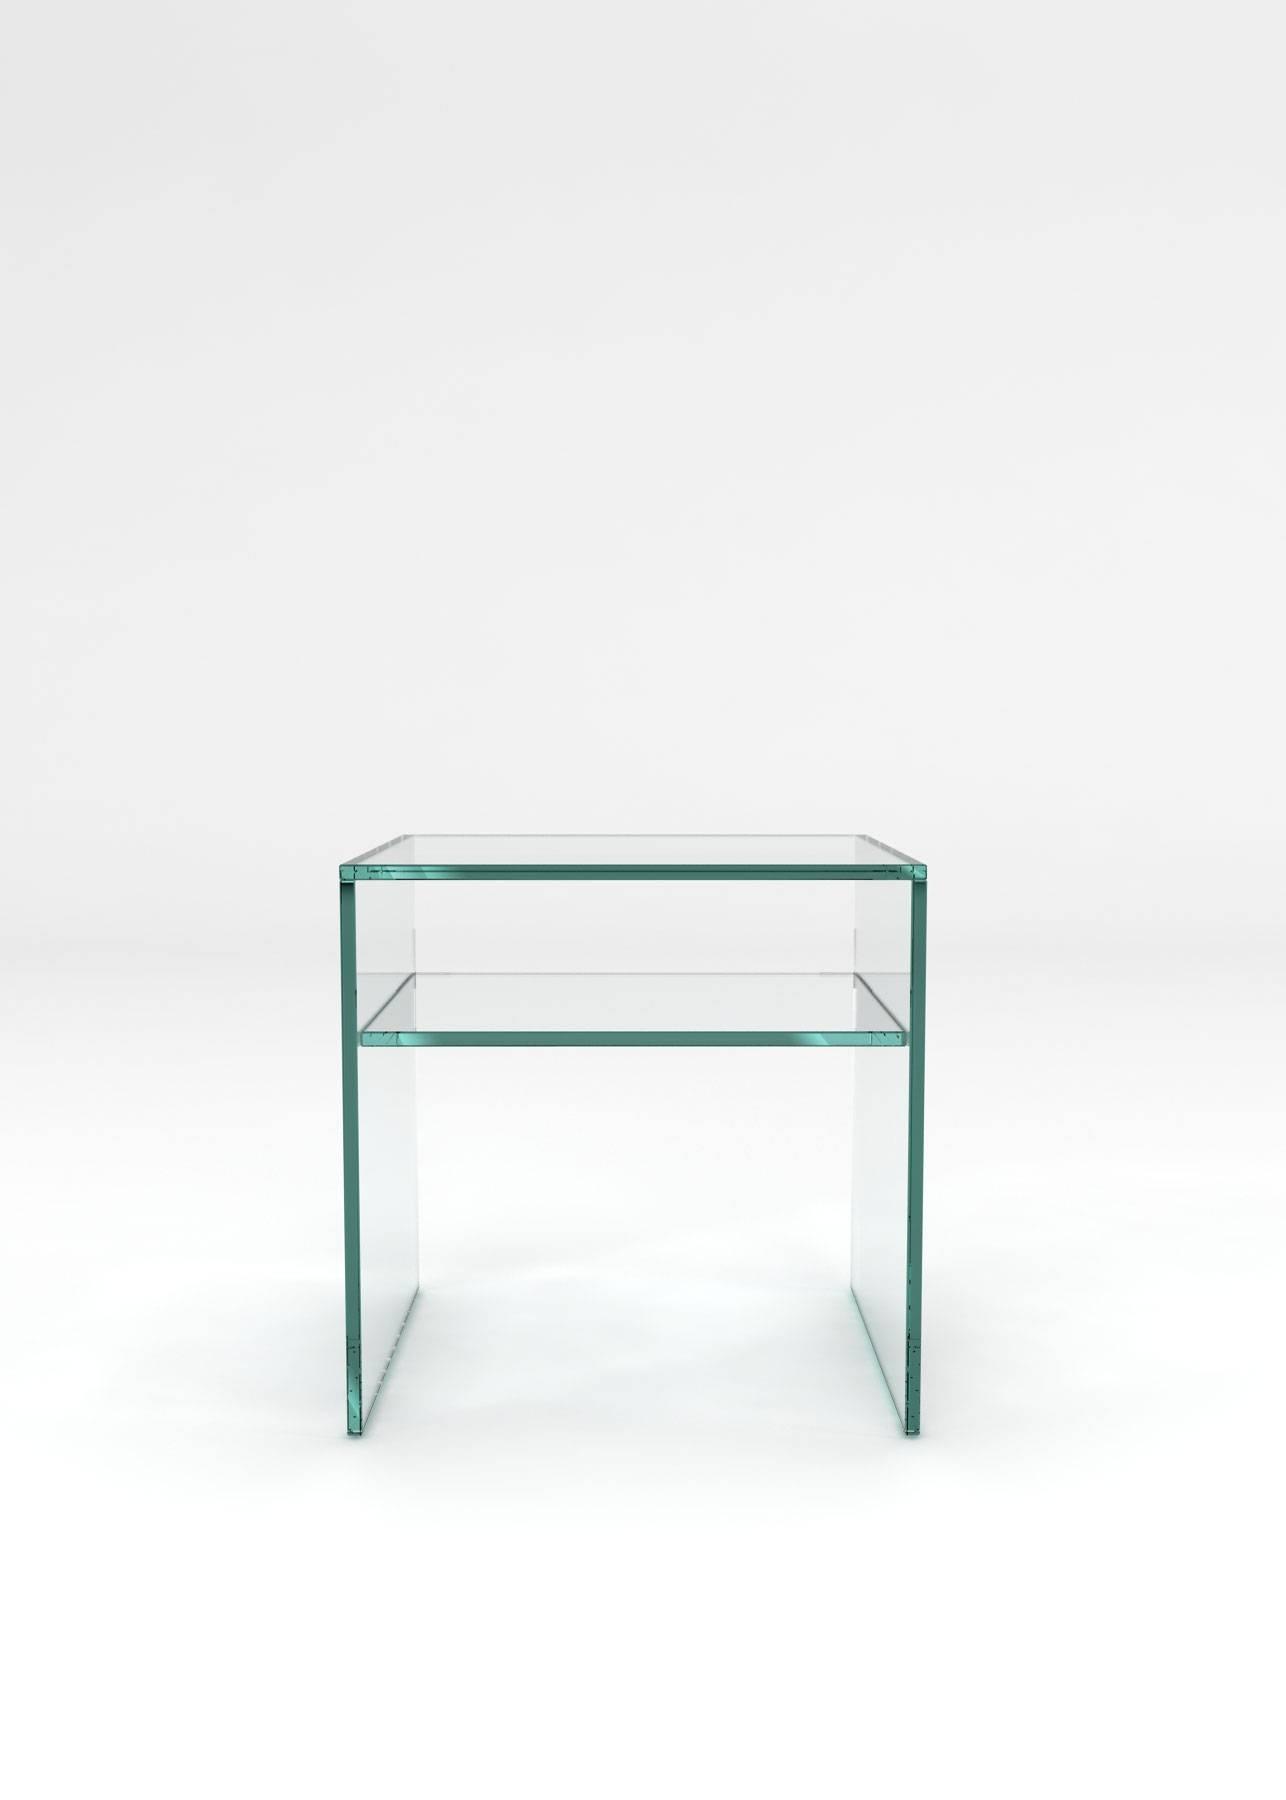 Crystal Glass Side Table 1 Shelfglassdomain - Glassdomain within Glass Coffee Table With Shelf (Image 6 of 15)